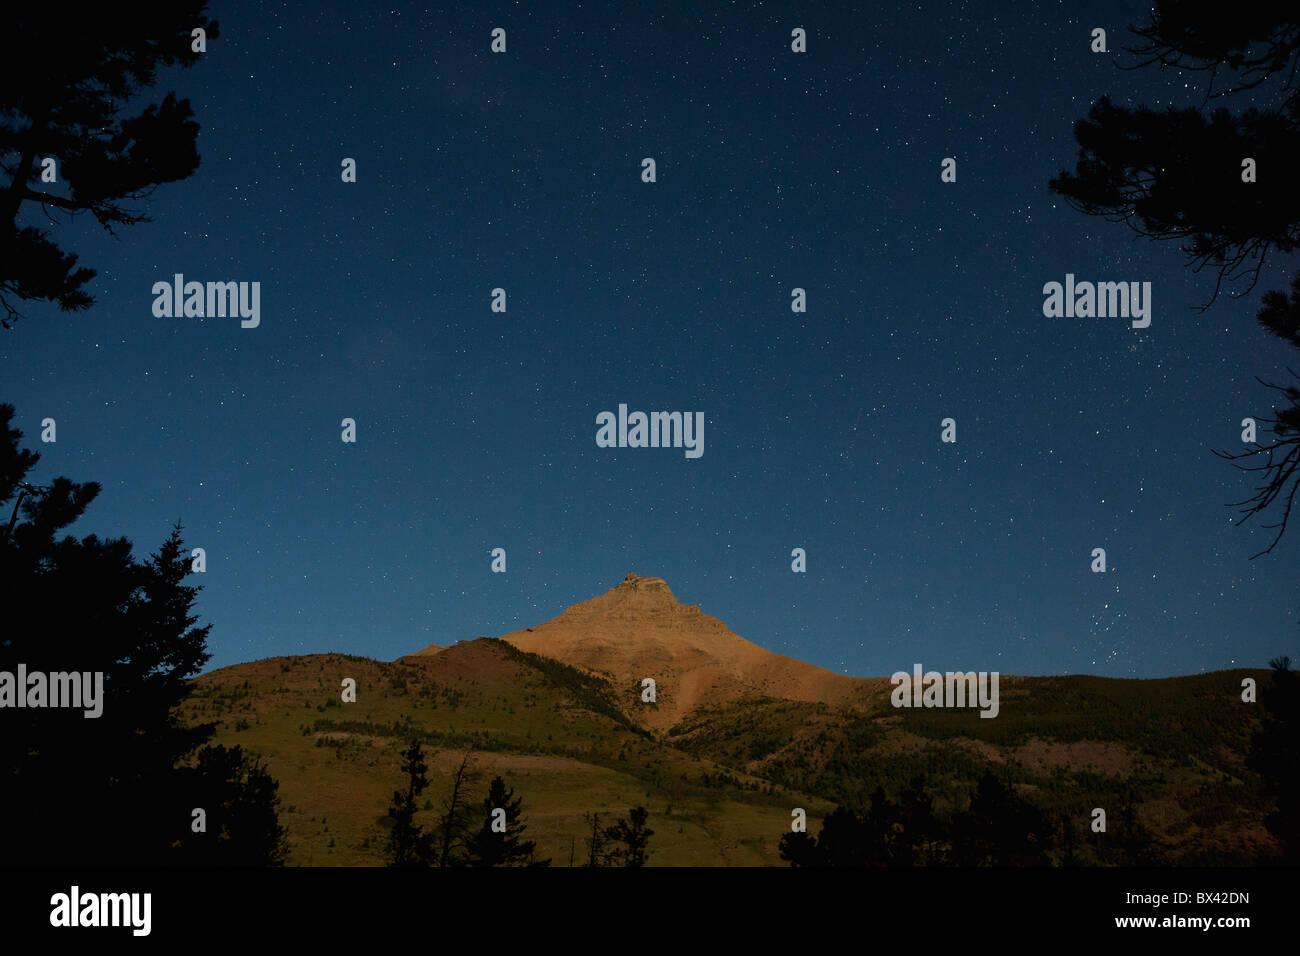 Moon Lit Mountain With Stars In The Sky; Waterton, Alberta, Canada Stock Photo